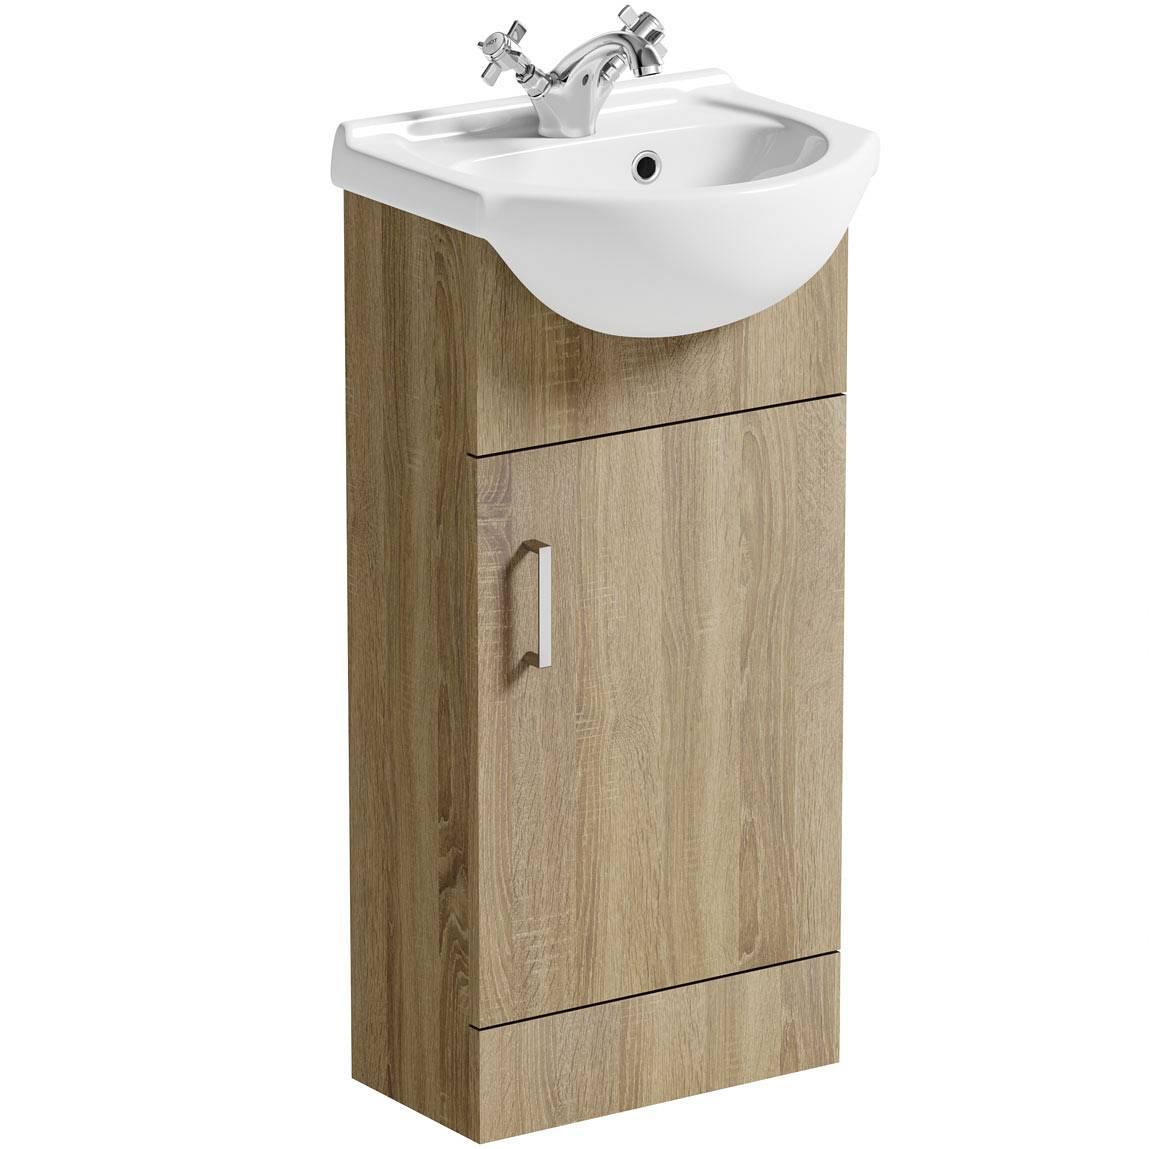 Image of Sienna Oak 41 Vanity Unit & Basin